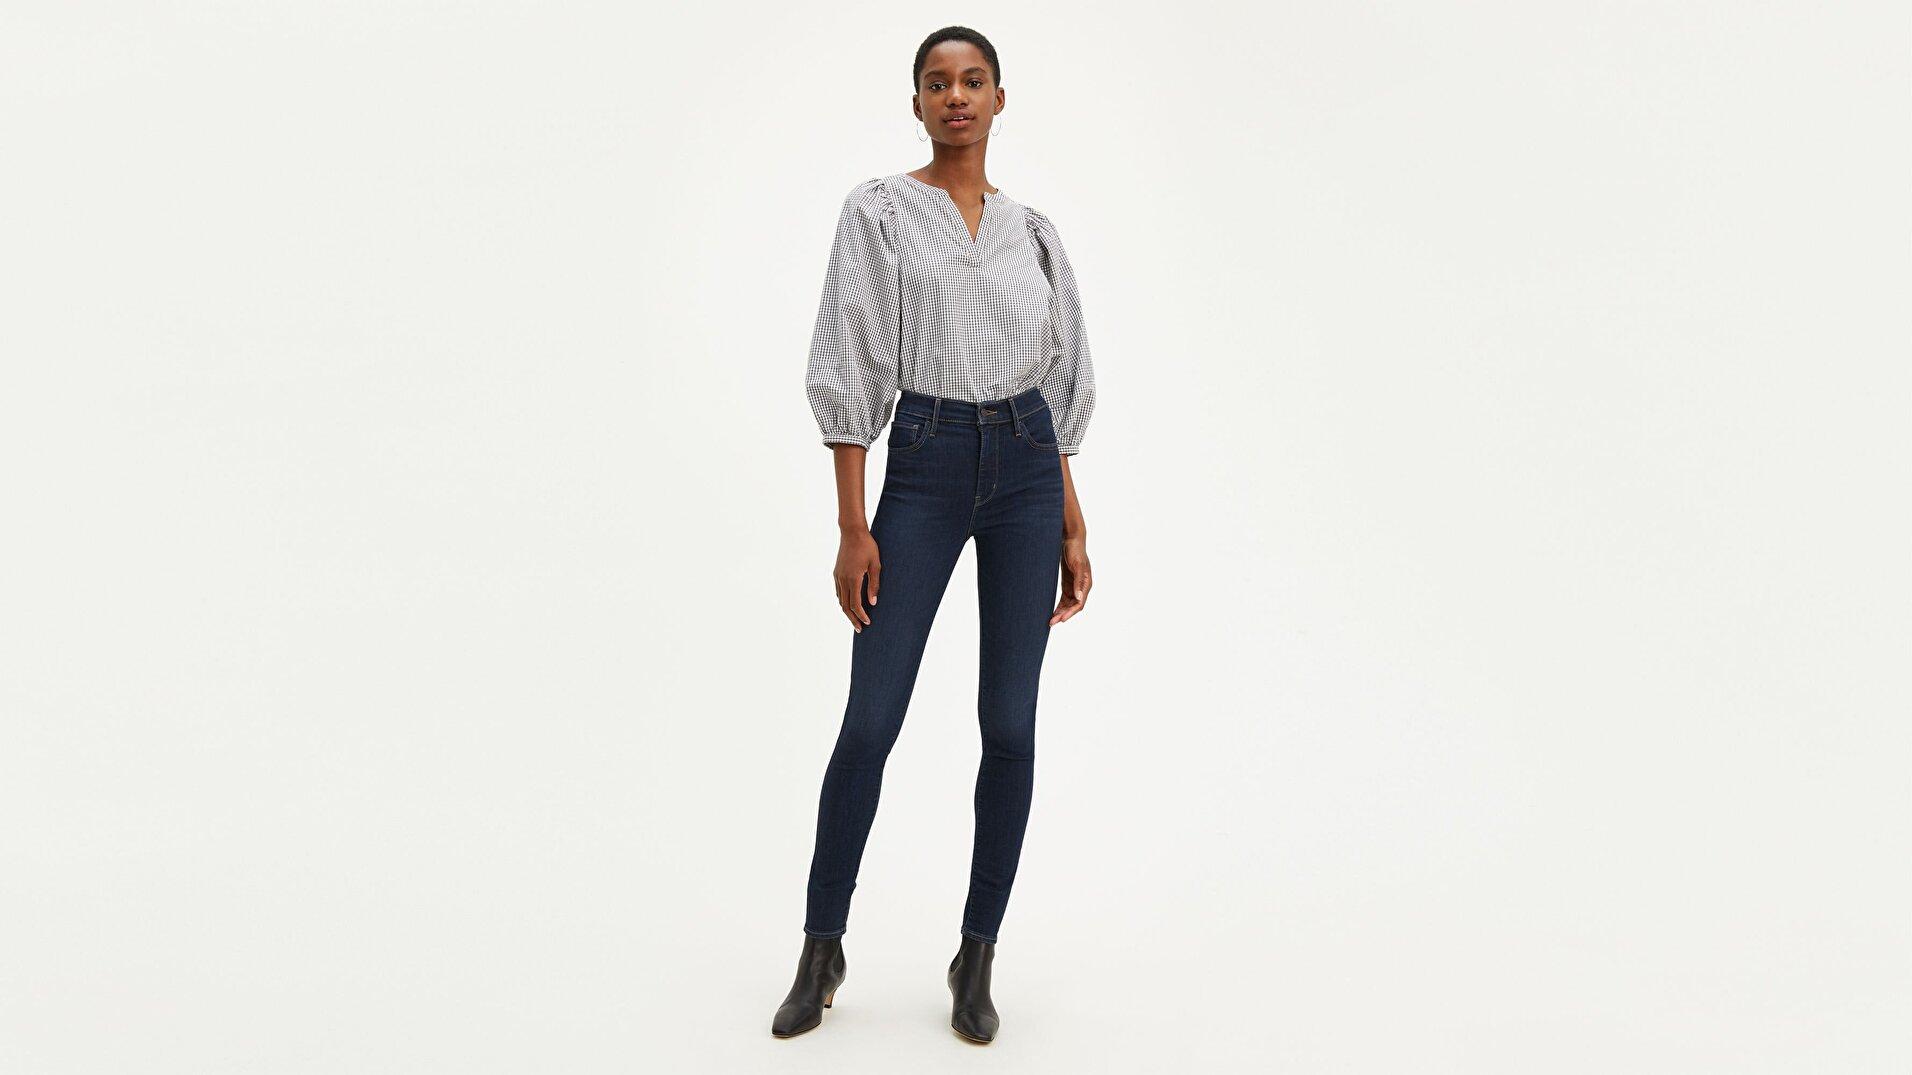 720 Yüksek Bel Süper Skinny Kadın Jean Pantolon-Deep Serenity